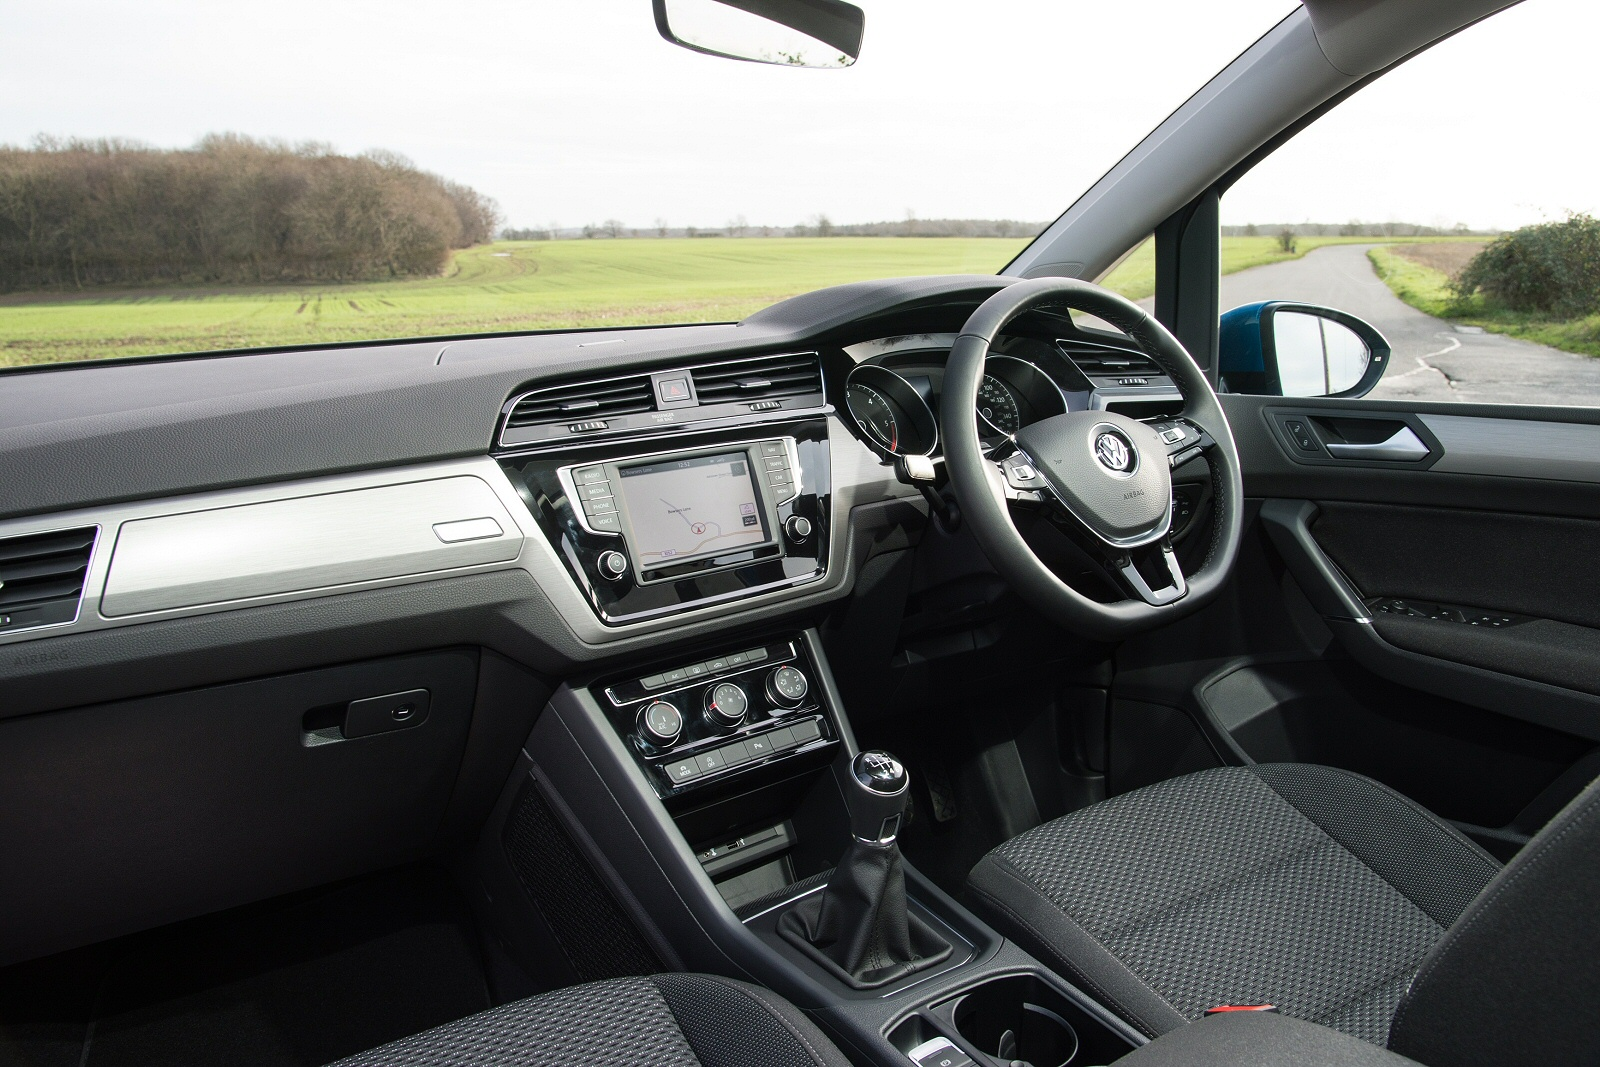 New Volkswagen Touran 2.0 Tdi Se Family 5Dr Dsg Diesel Estate for Sale    Vertu Volkswagen